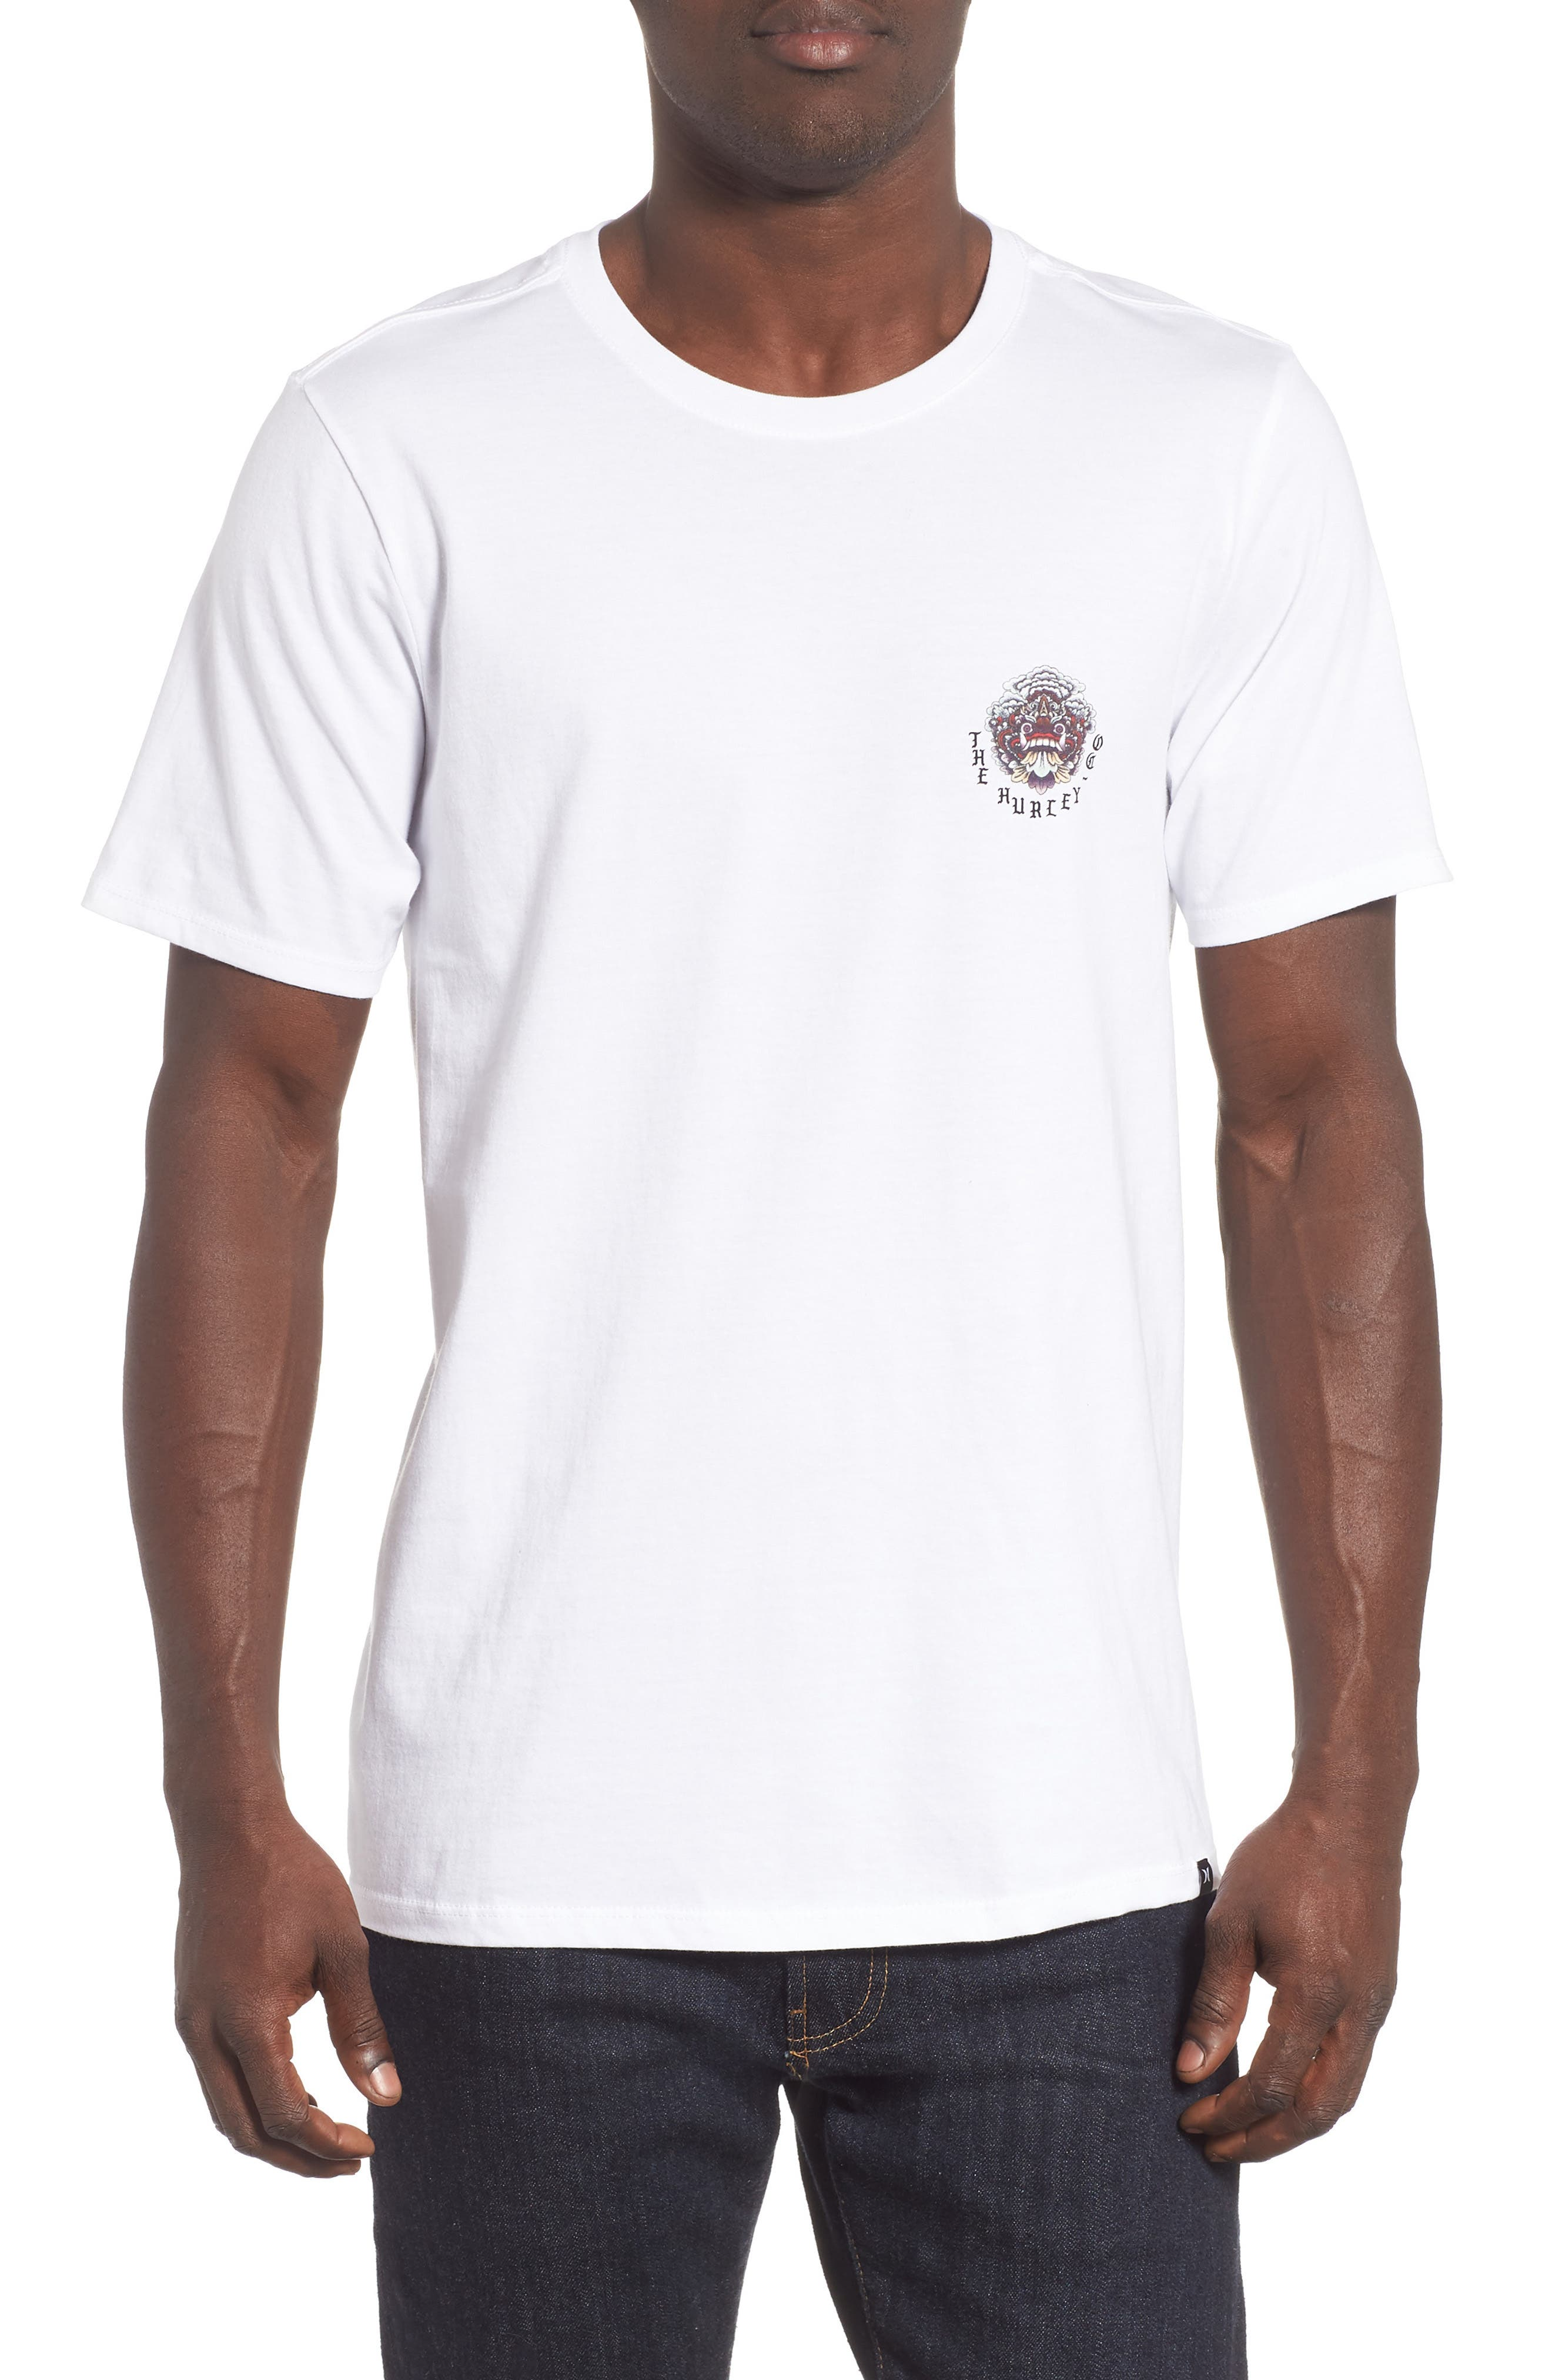 HURLEY Premium Bagus T-Shirt in White